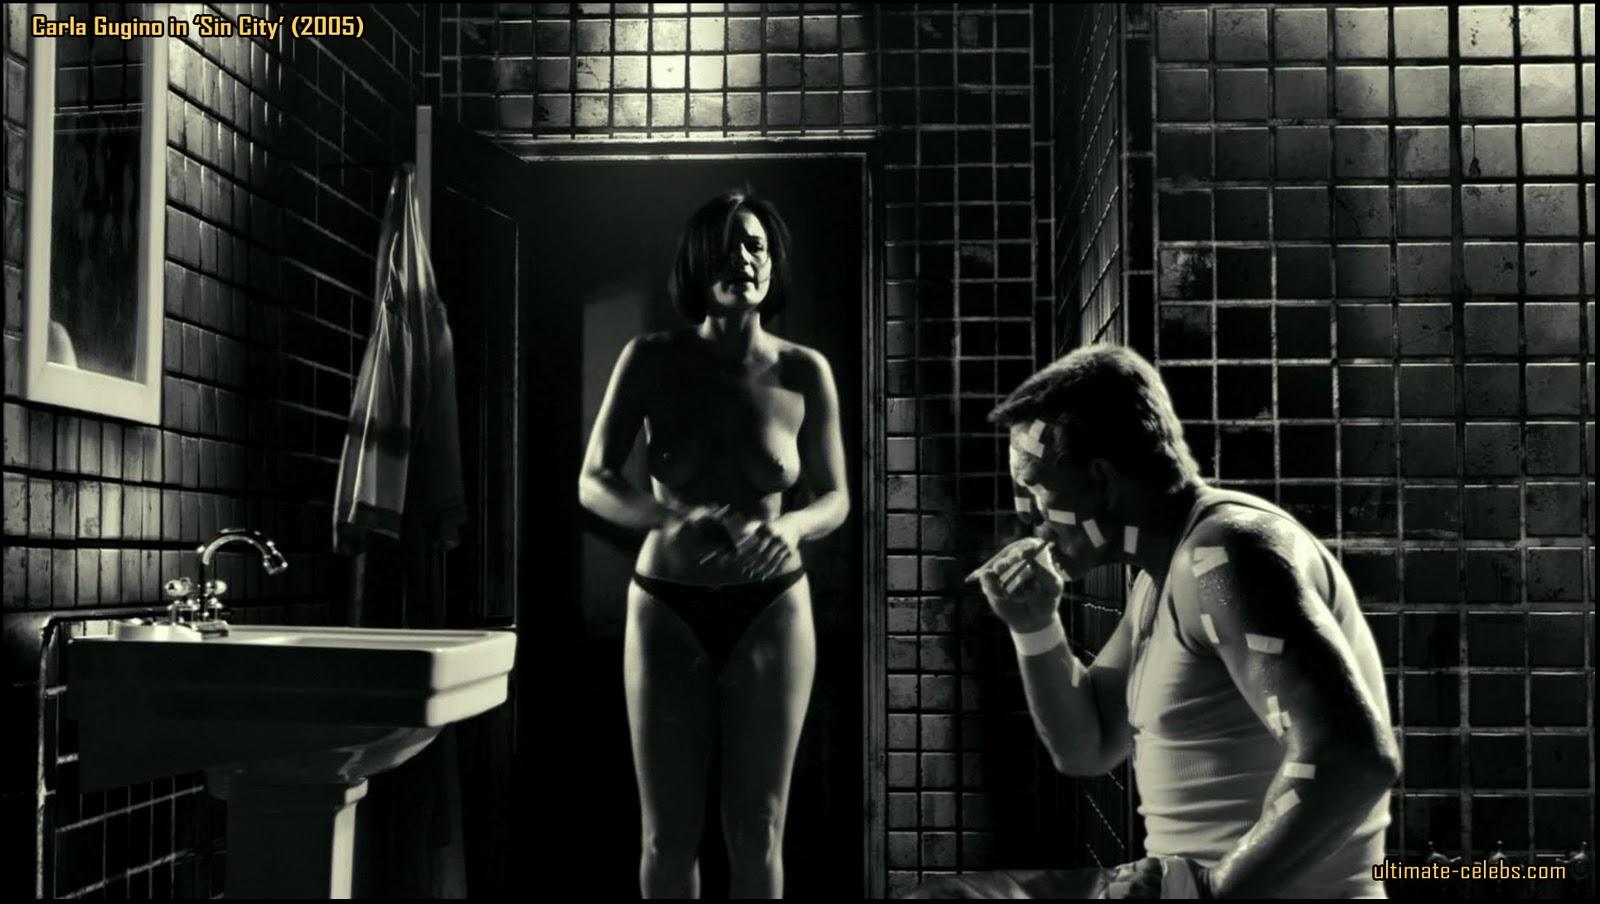 Namitonz Hot Cougar Carla Gugino-4171